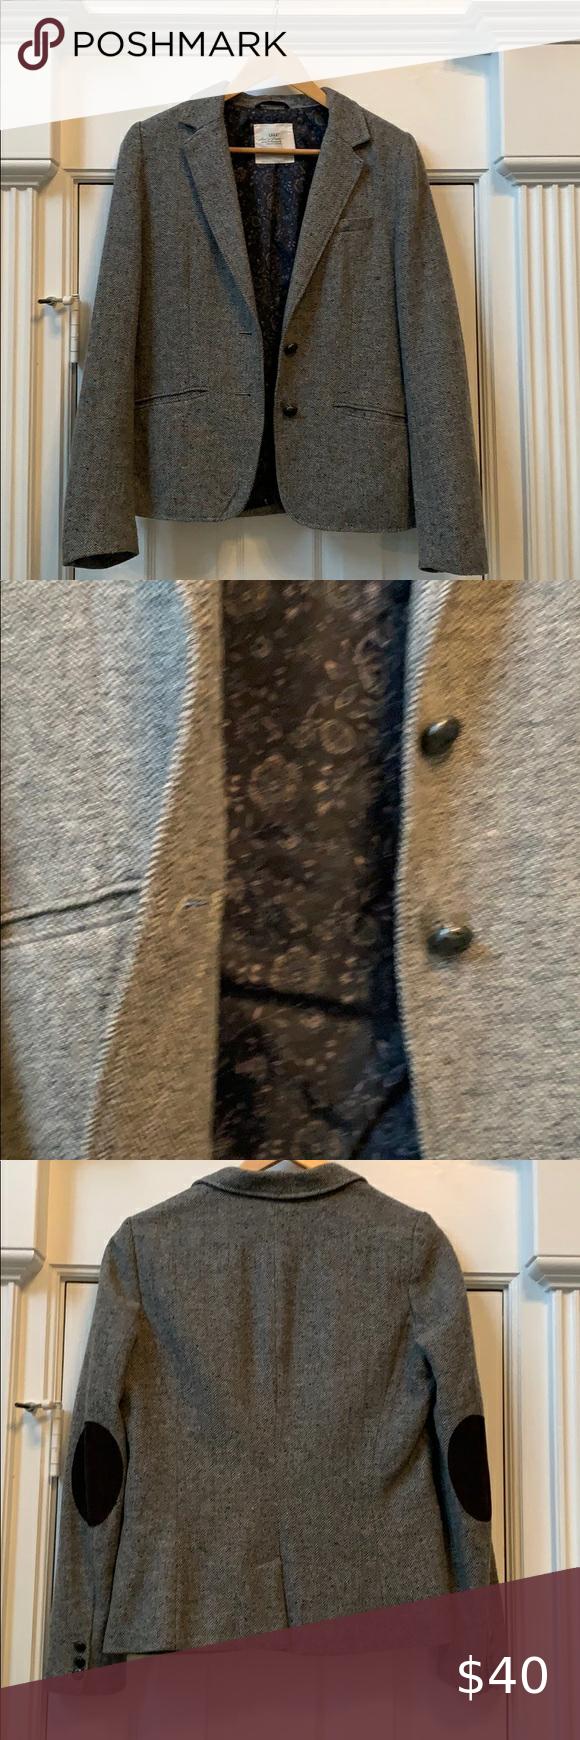 Tweed jacket with elbow patches in Tweed jacket